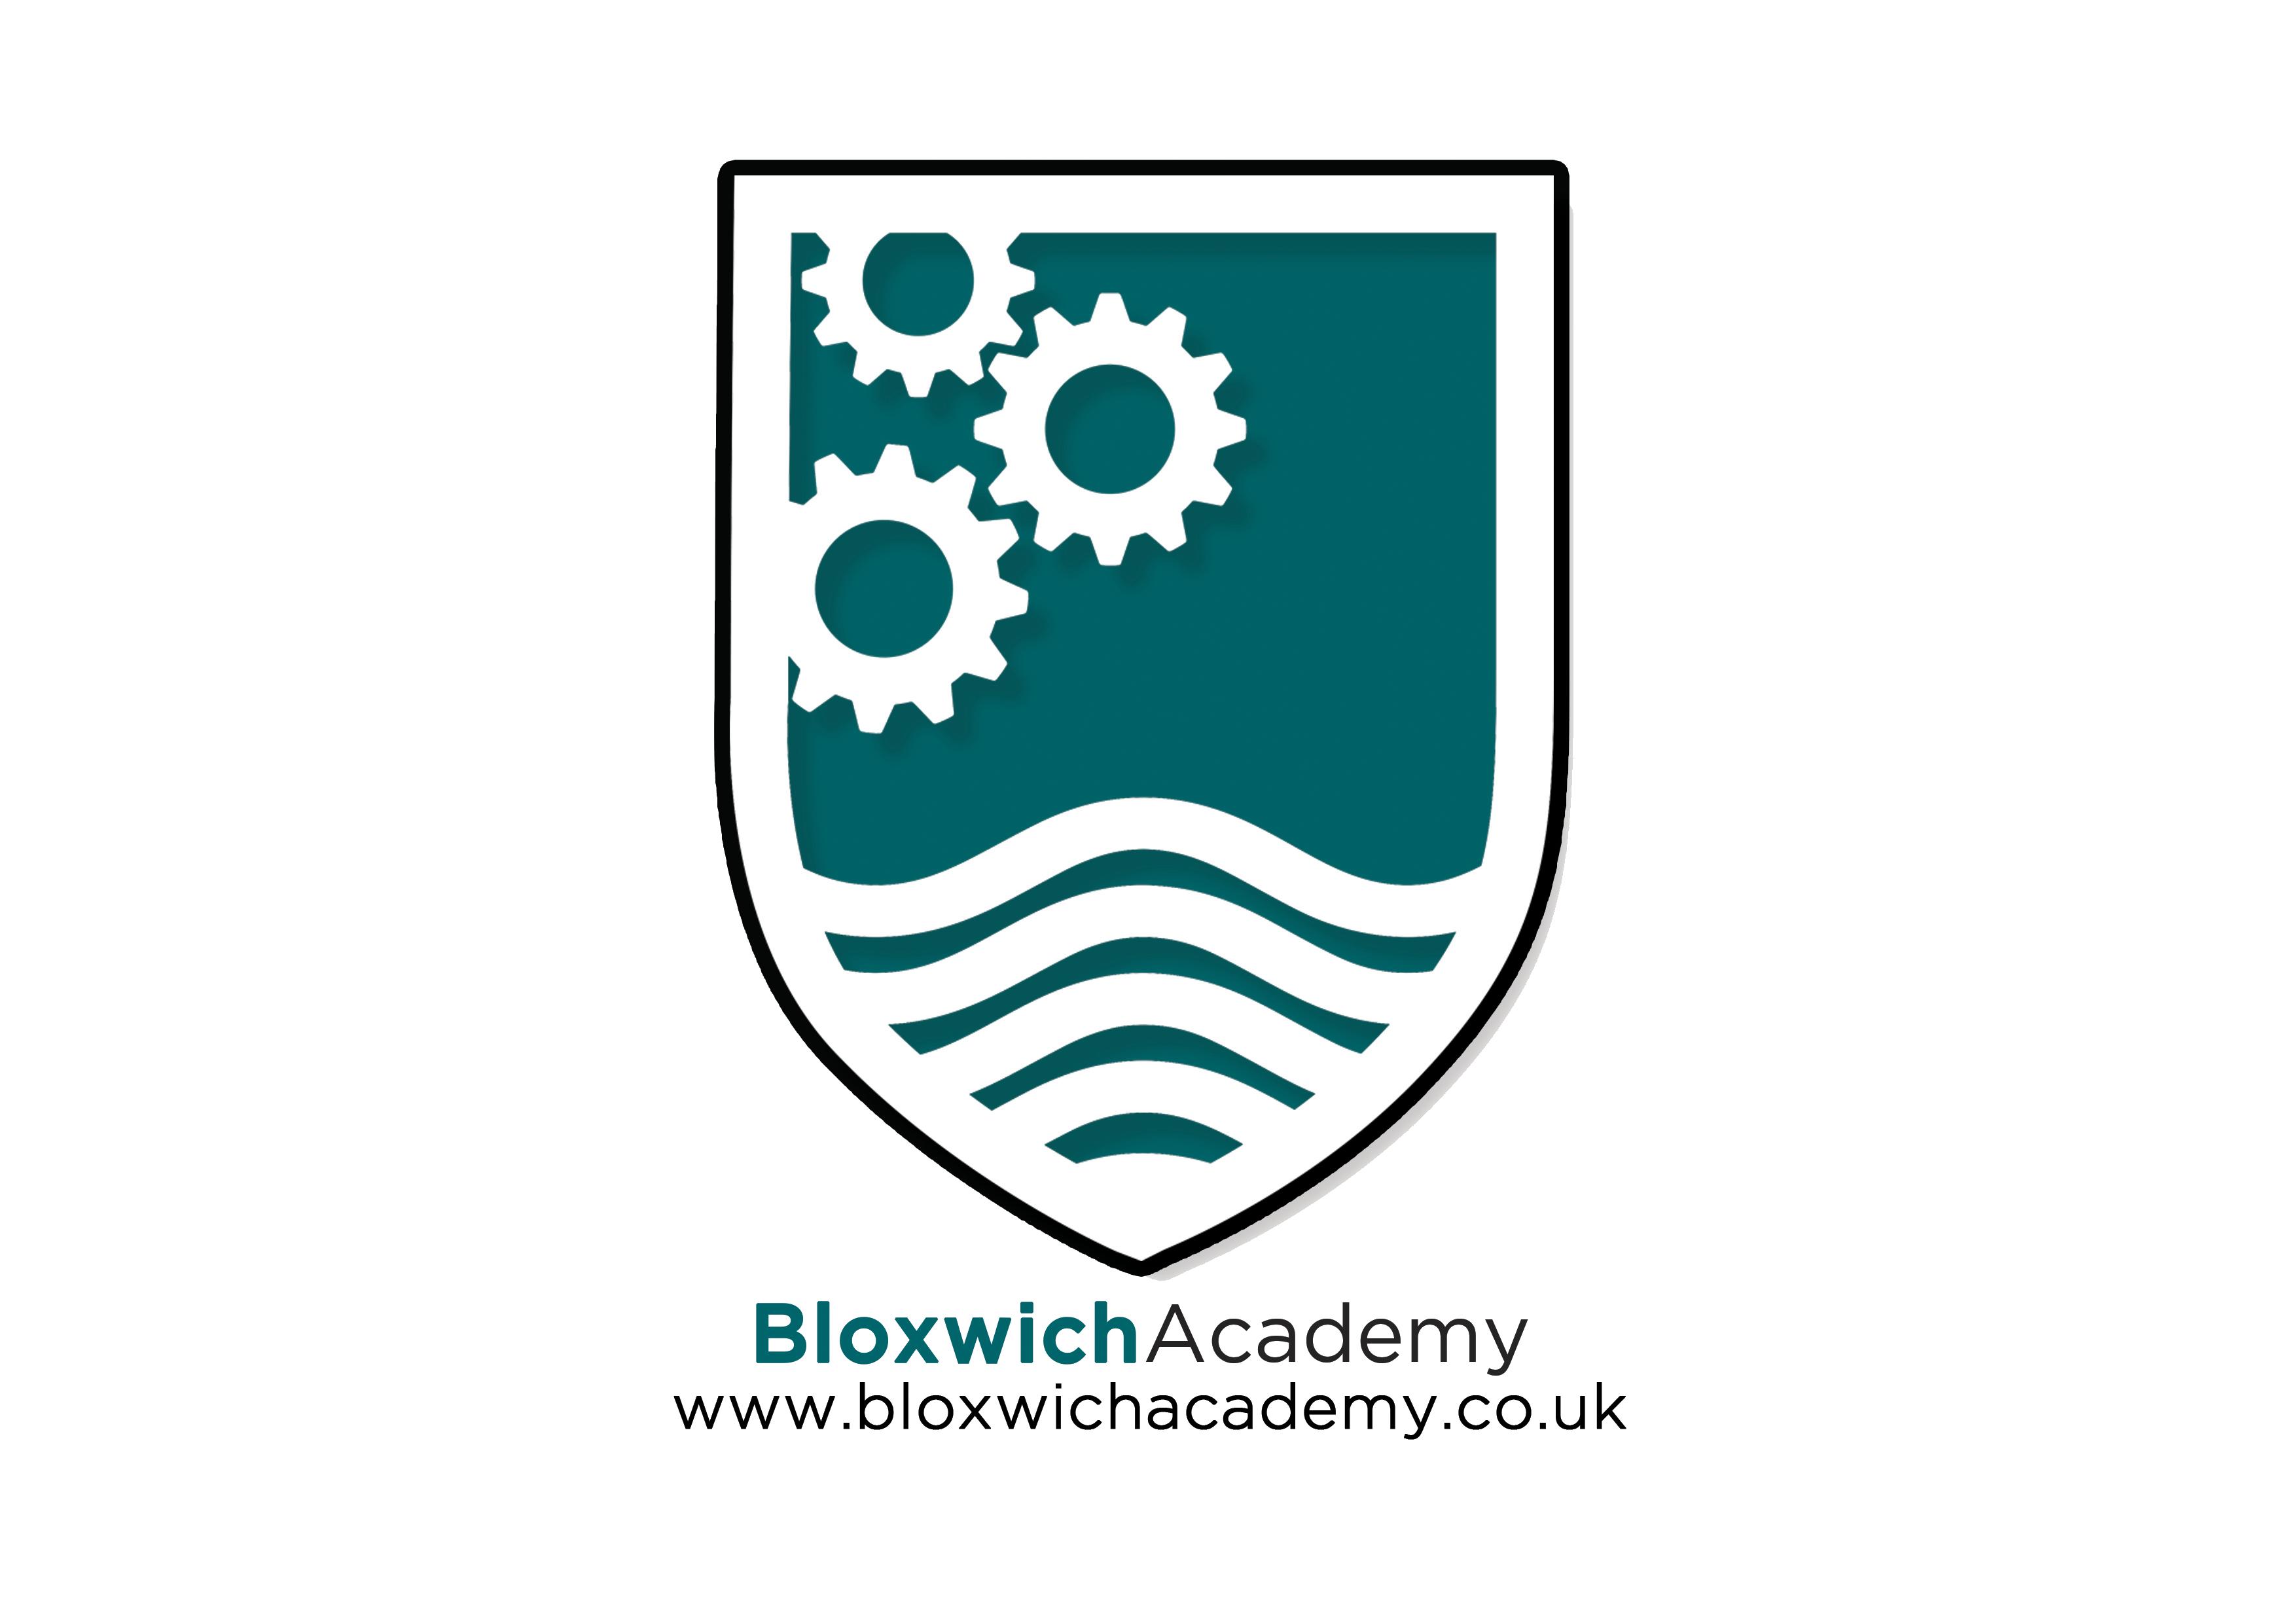 Bloxwich Academy